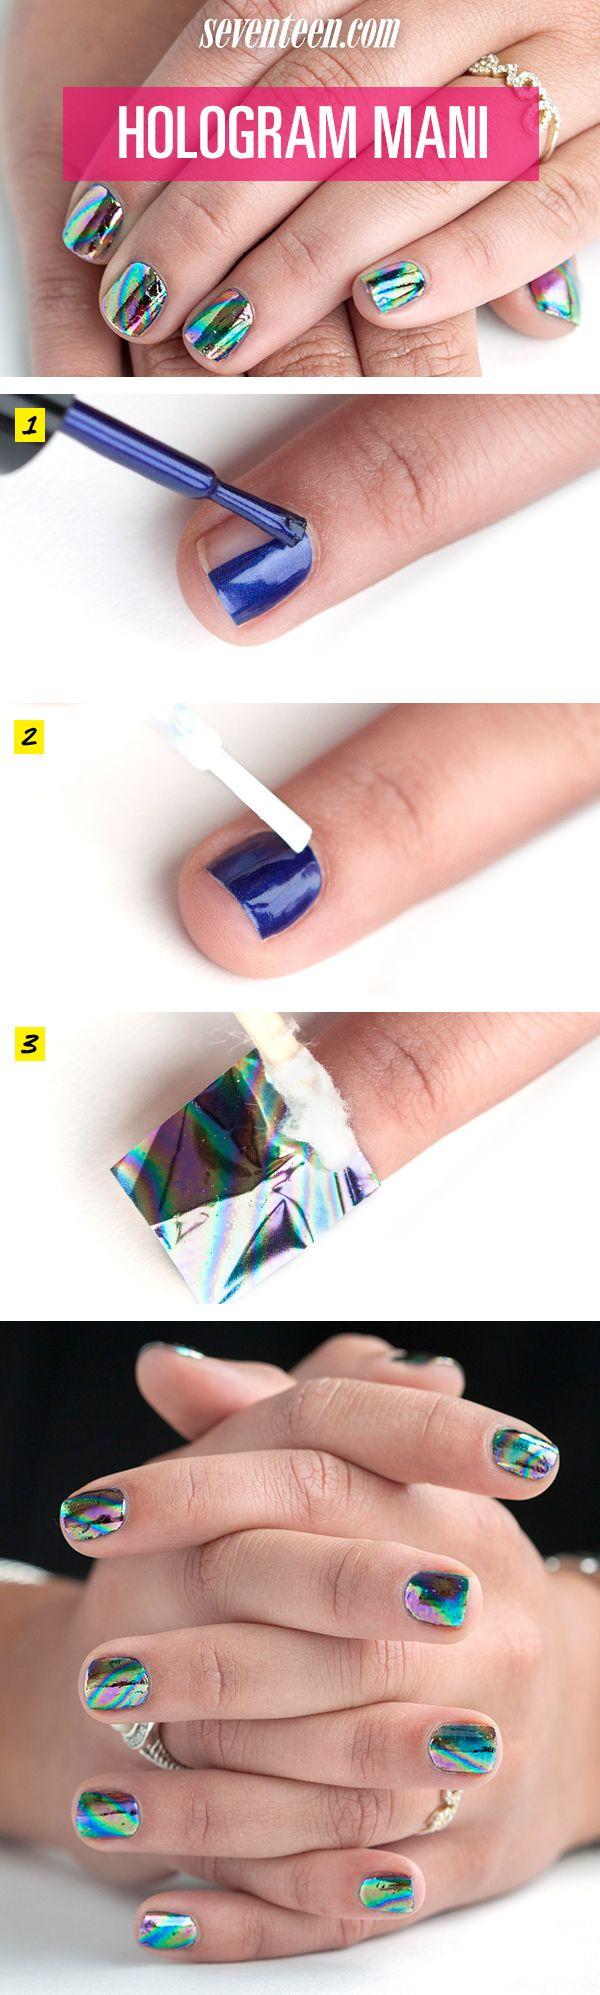 Hologram Nail Art Tutorial - Hologram Foil Manicure How To - Seventeen